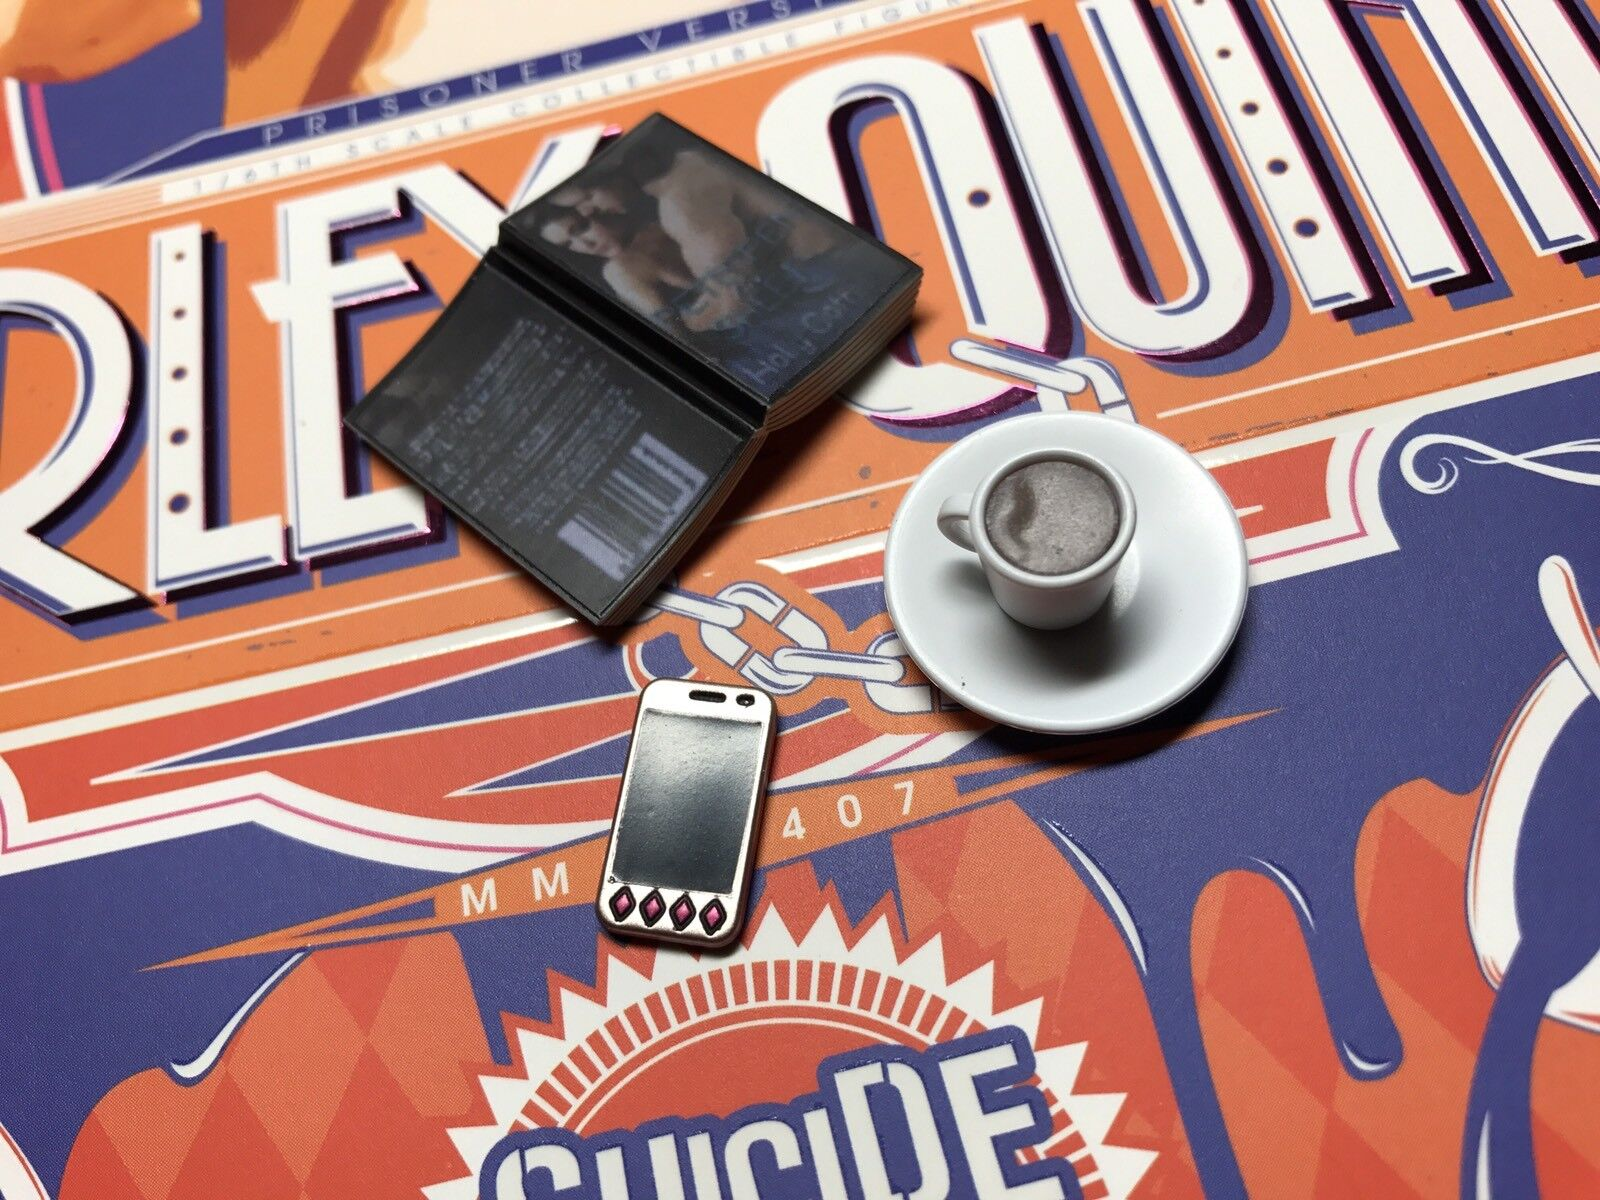 Hot Toys SUICIDE SQUAD HARLEY QUINN PRISONER VERSION 1 6 book   cup   phone